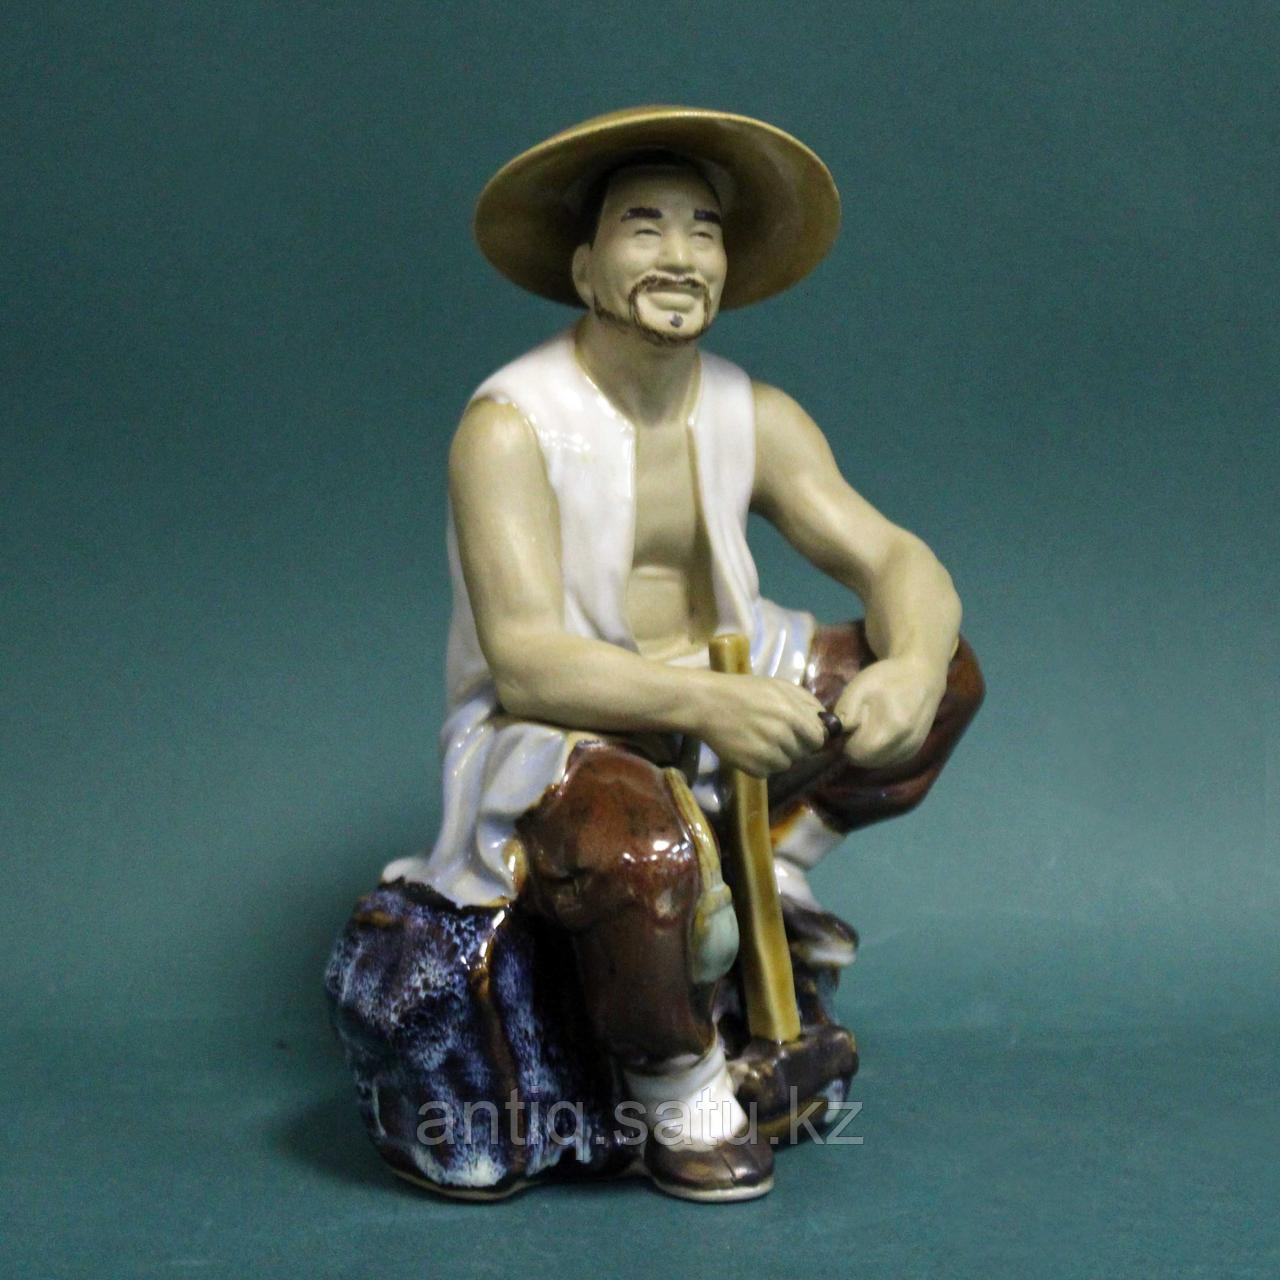 «Ремесленник» Китай. Середина ХХ века - фото 2